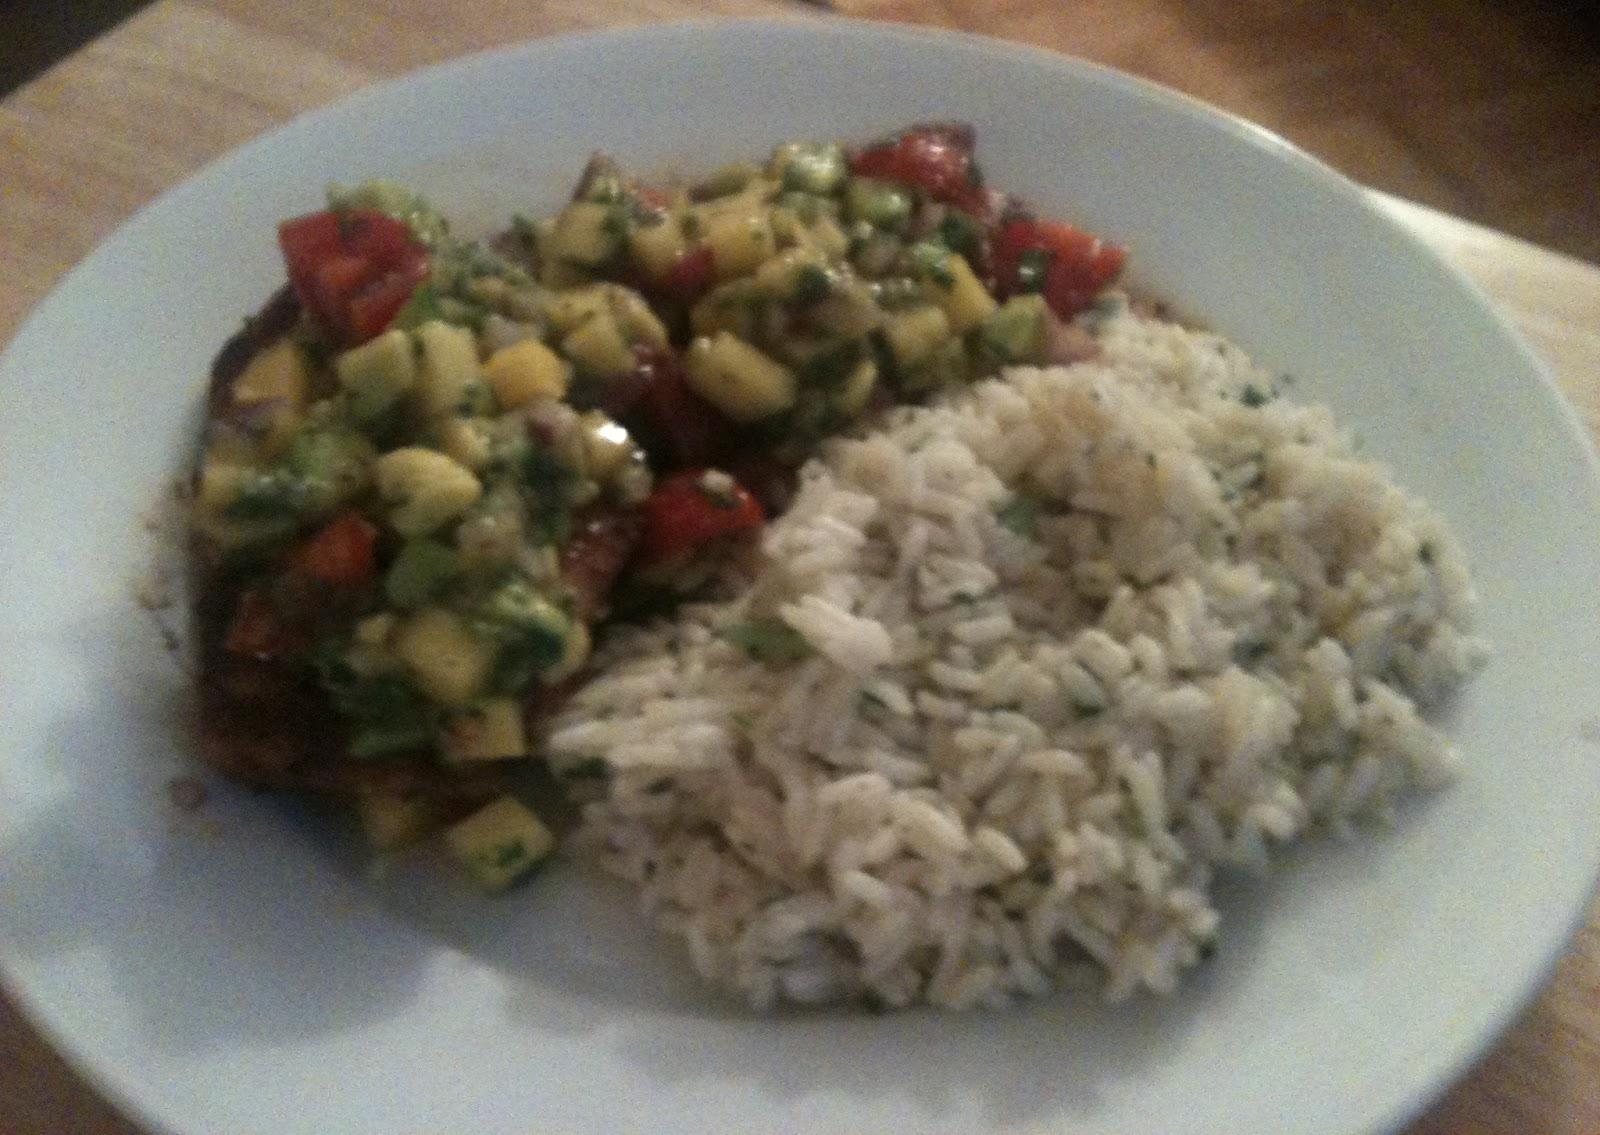 ... : Mole-Rubbed Chicken with Mango-Avocado Salsa and Lime Cilantro Rice